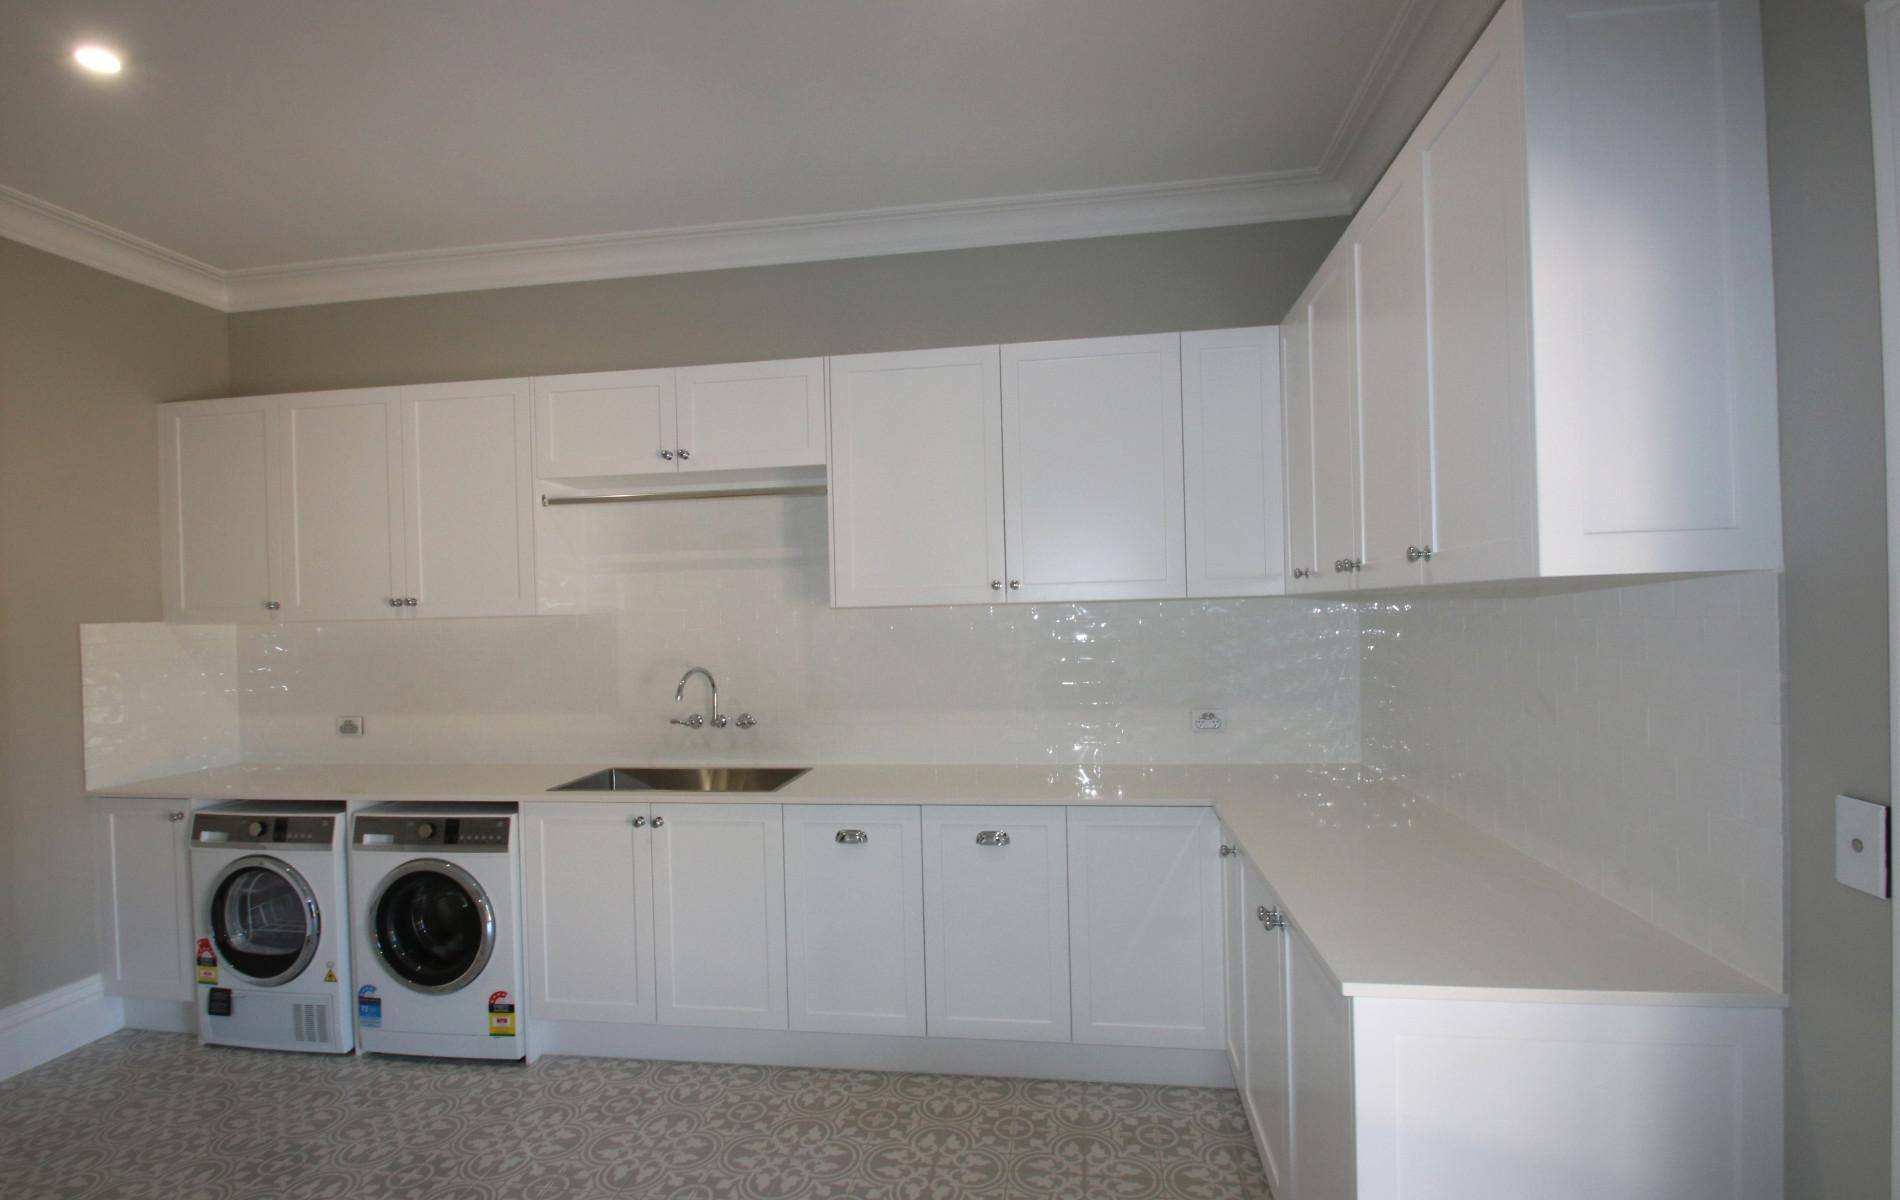 Laundry-Karen-Wallace-IMG_1774